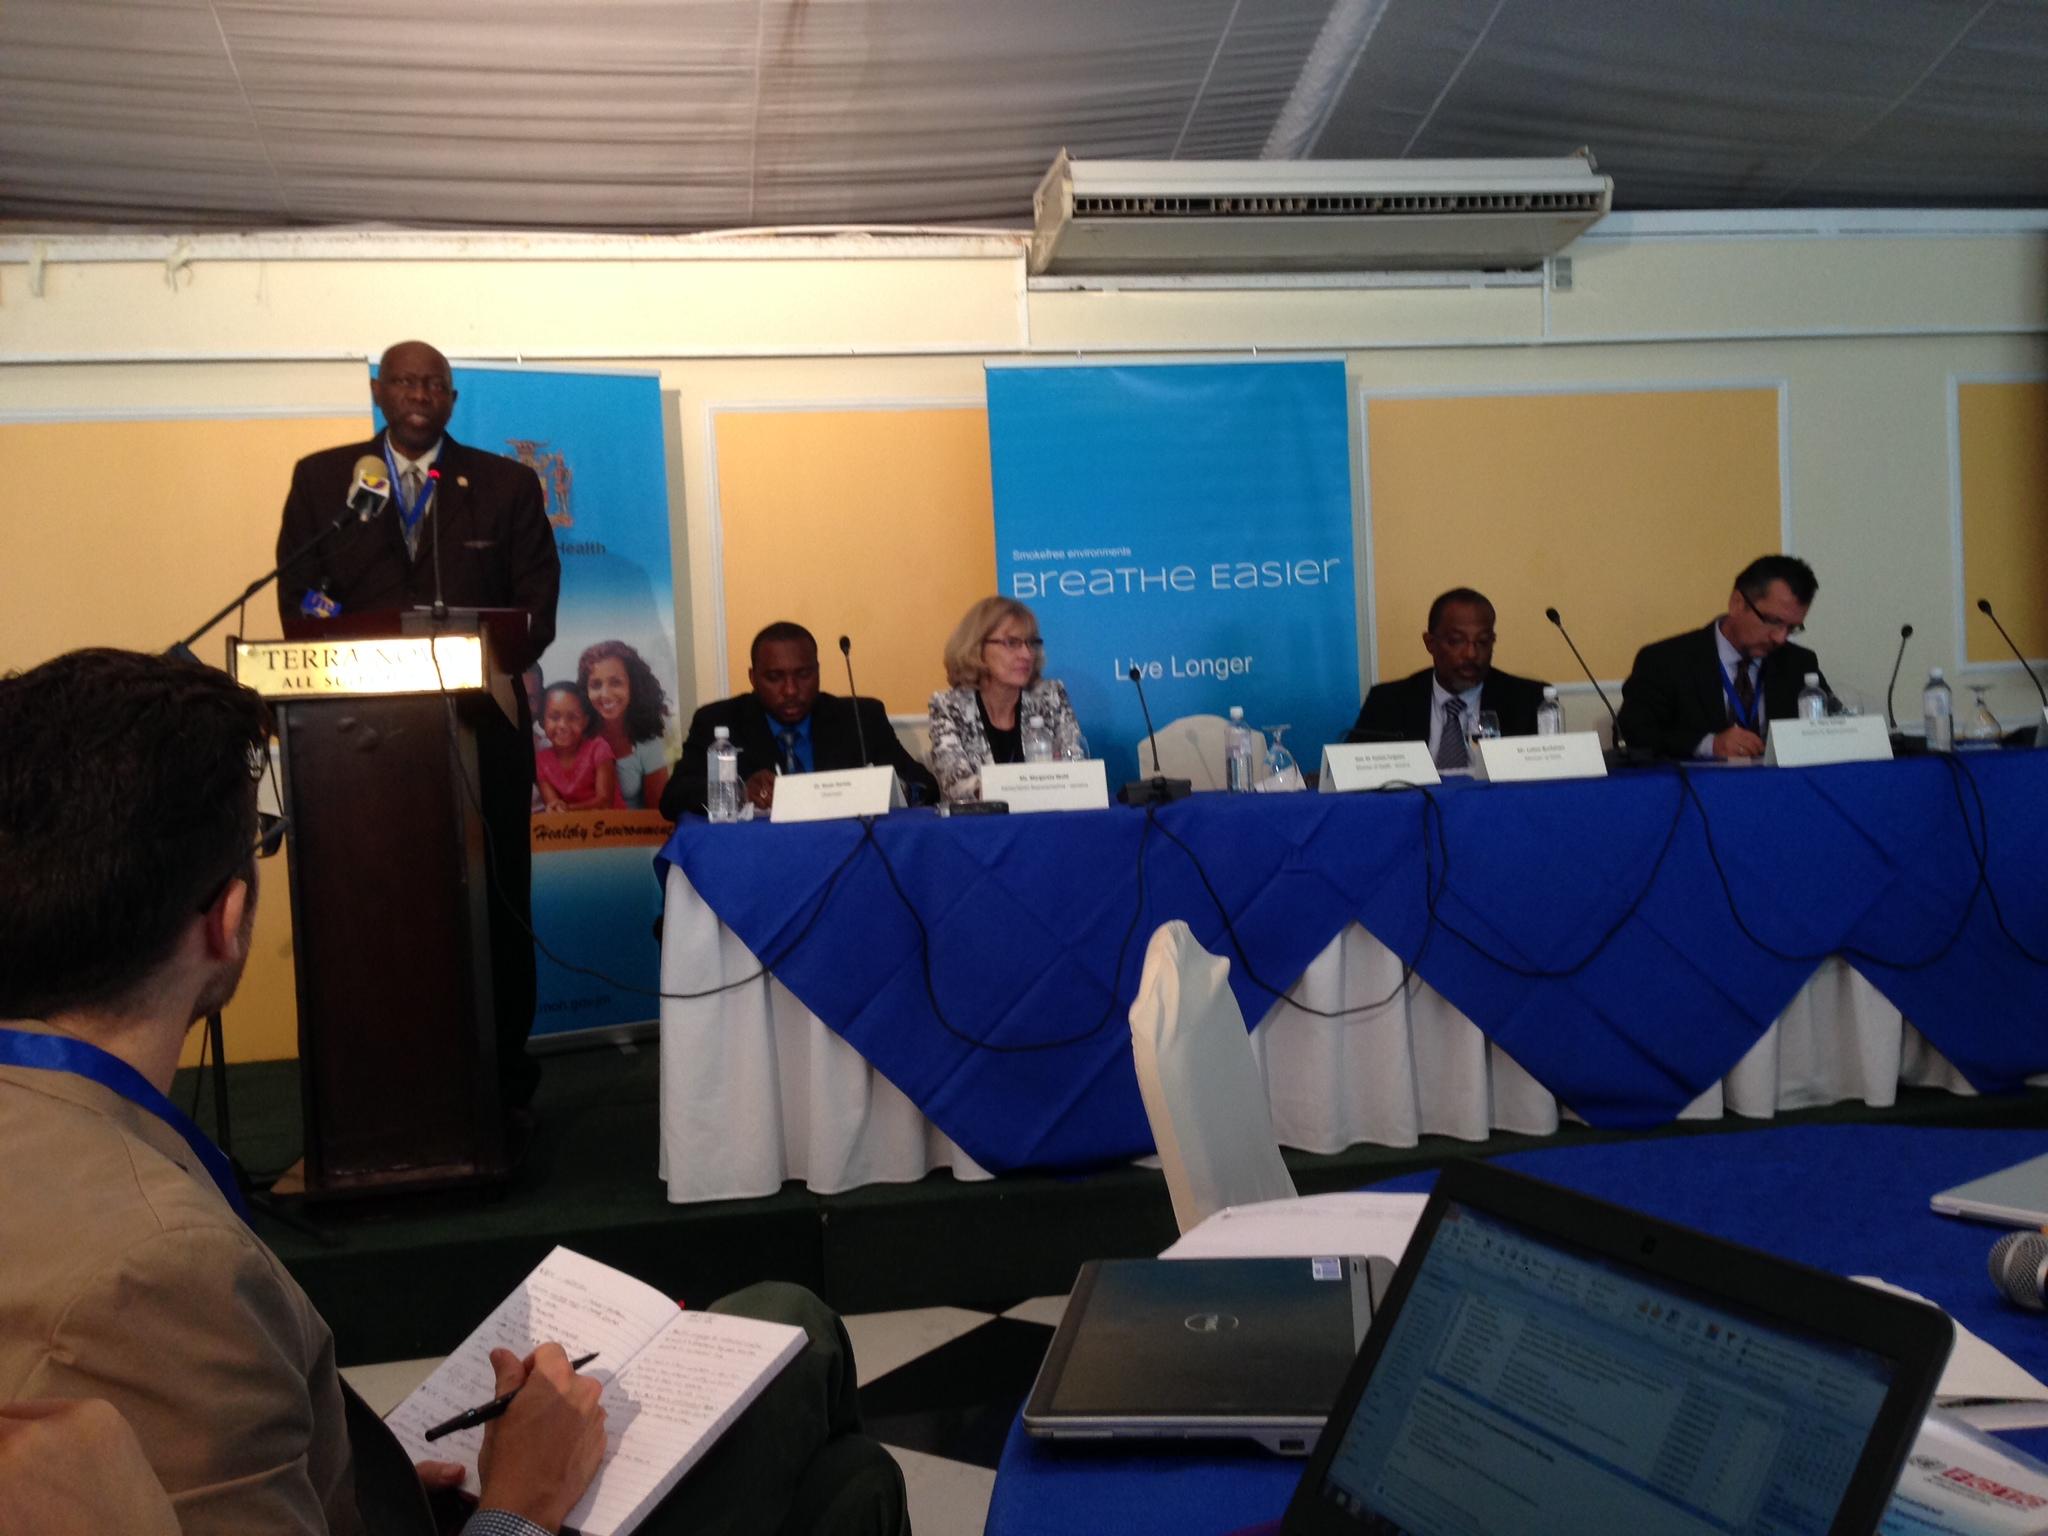 Hon. Minister of Health addressing the stakeholder meeting